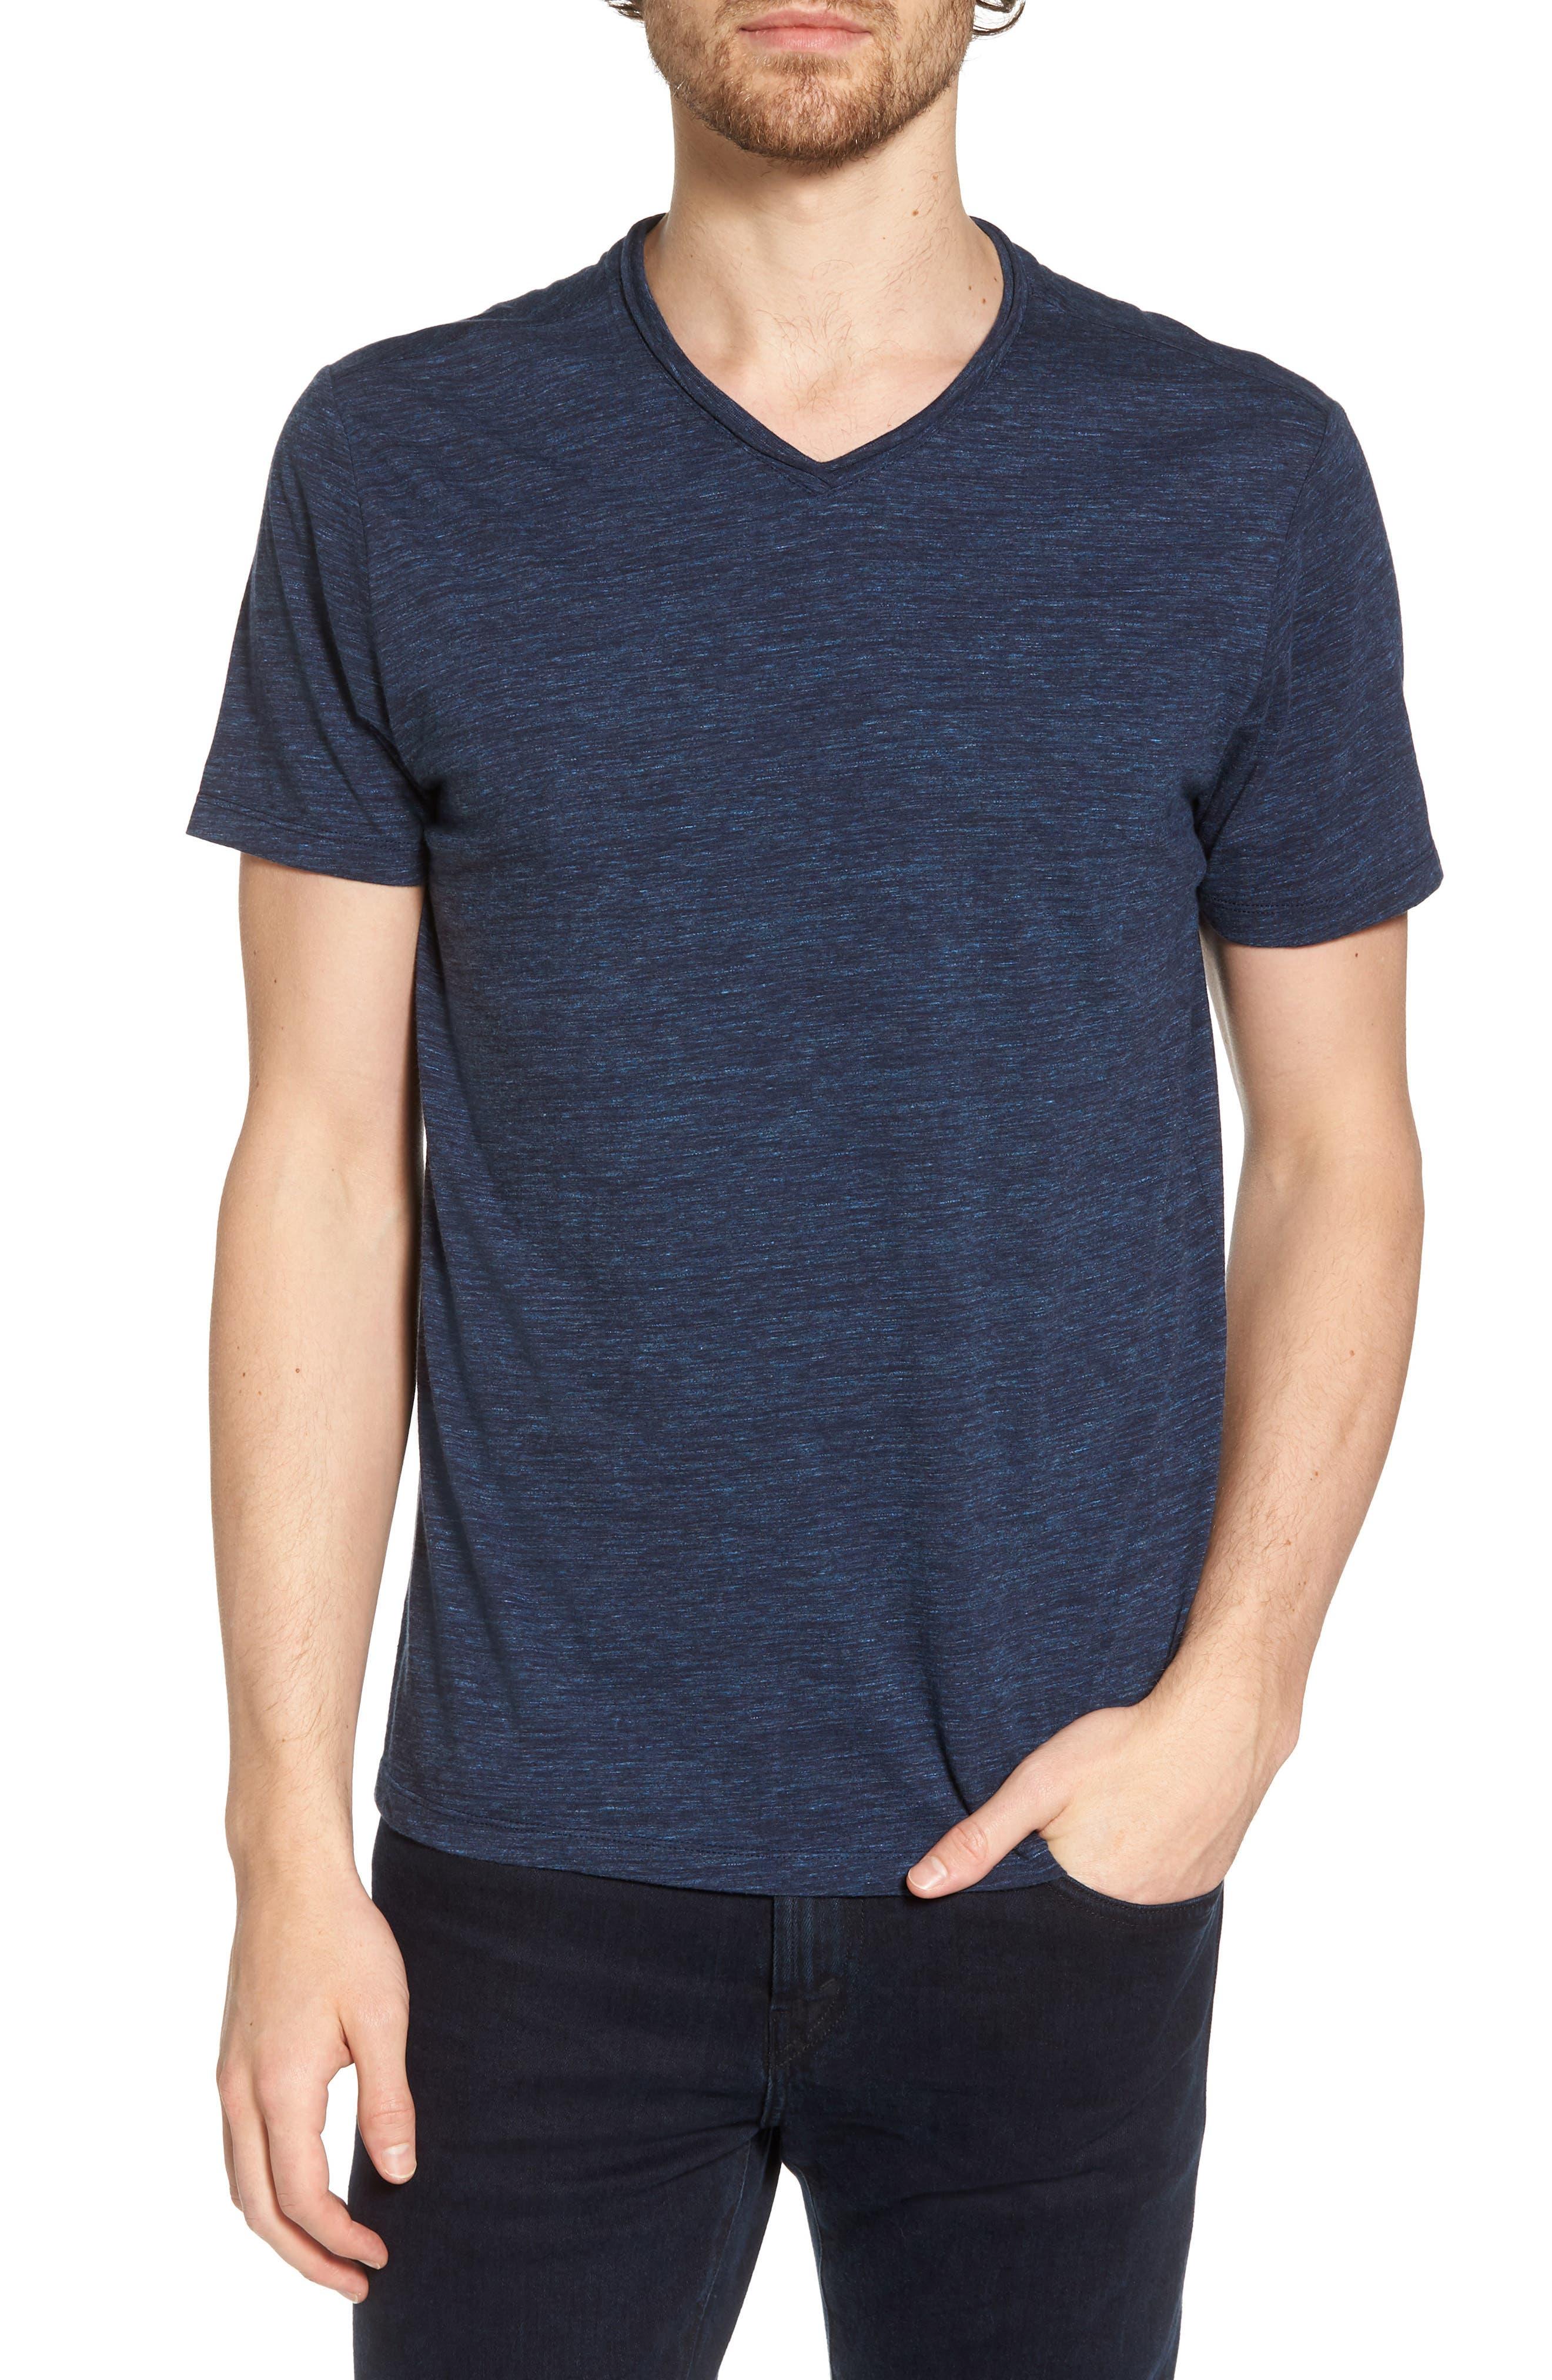 Robert Barakett John Smith T-Shirt